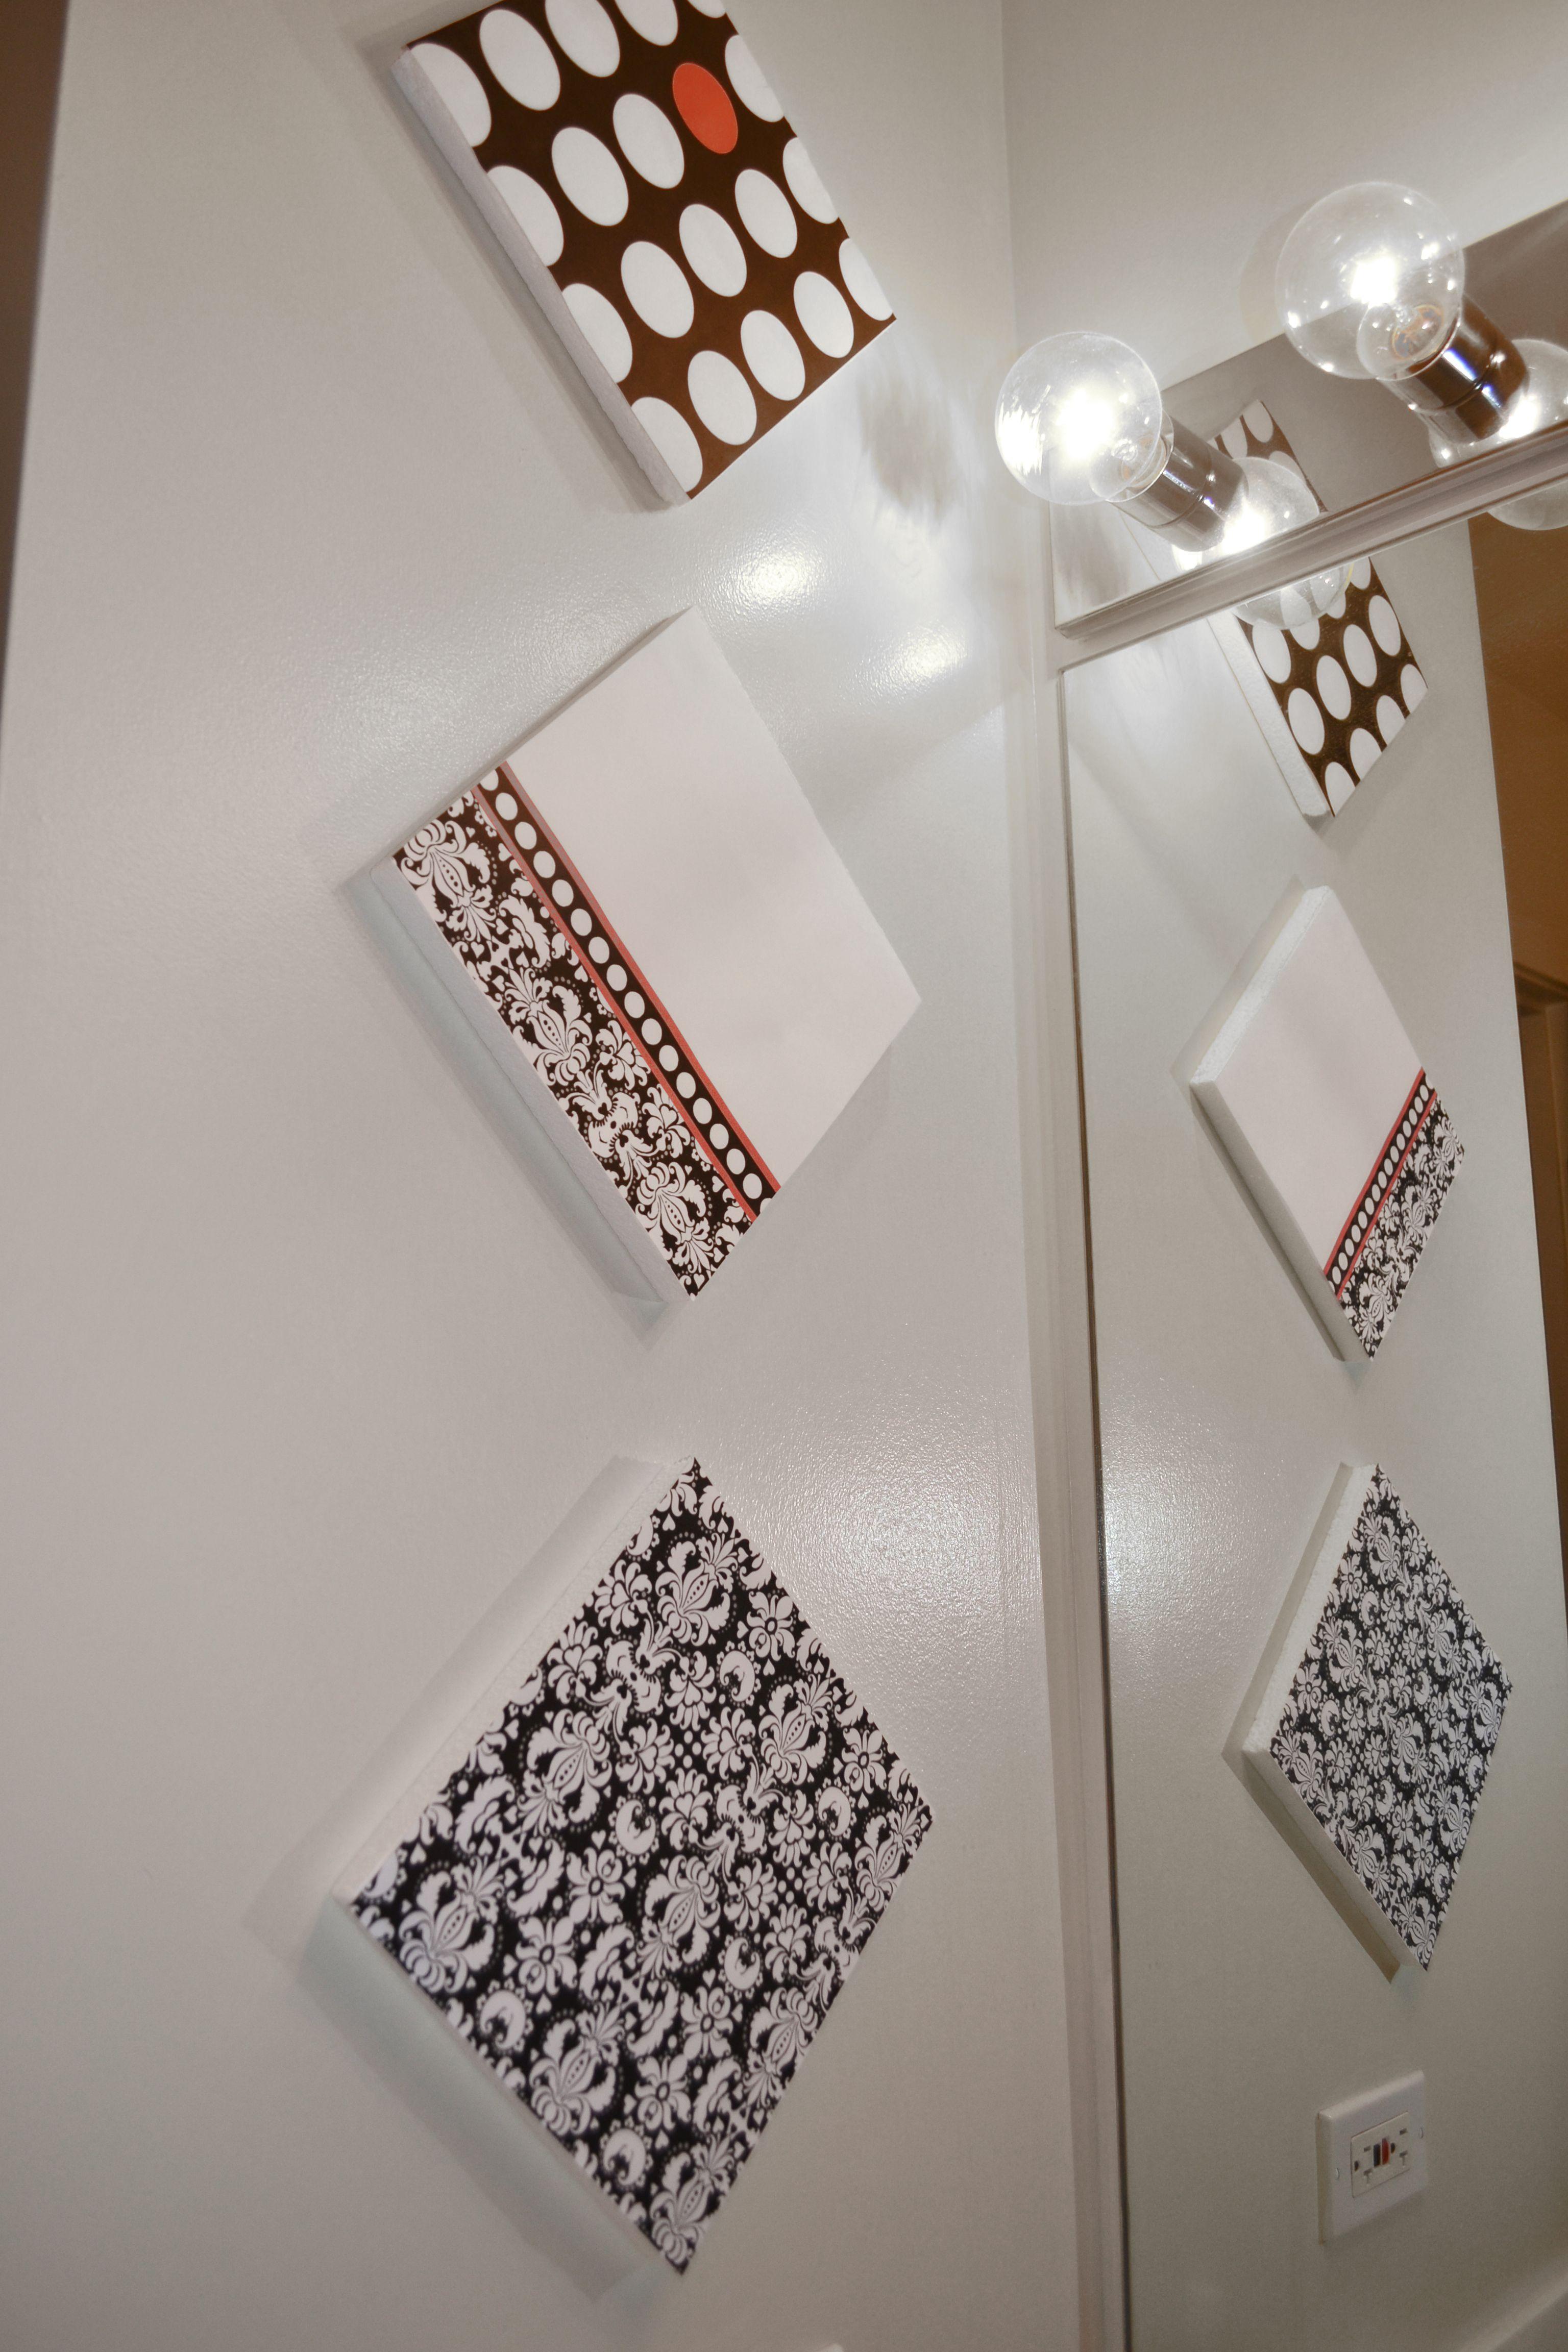 Diy Bathroom Decor My 3rd Diy Project All You Need Is A